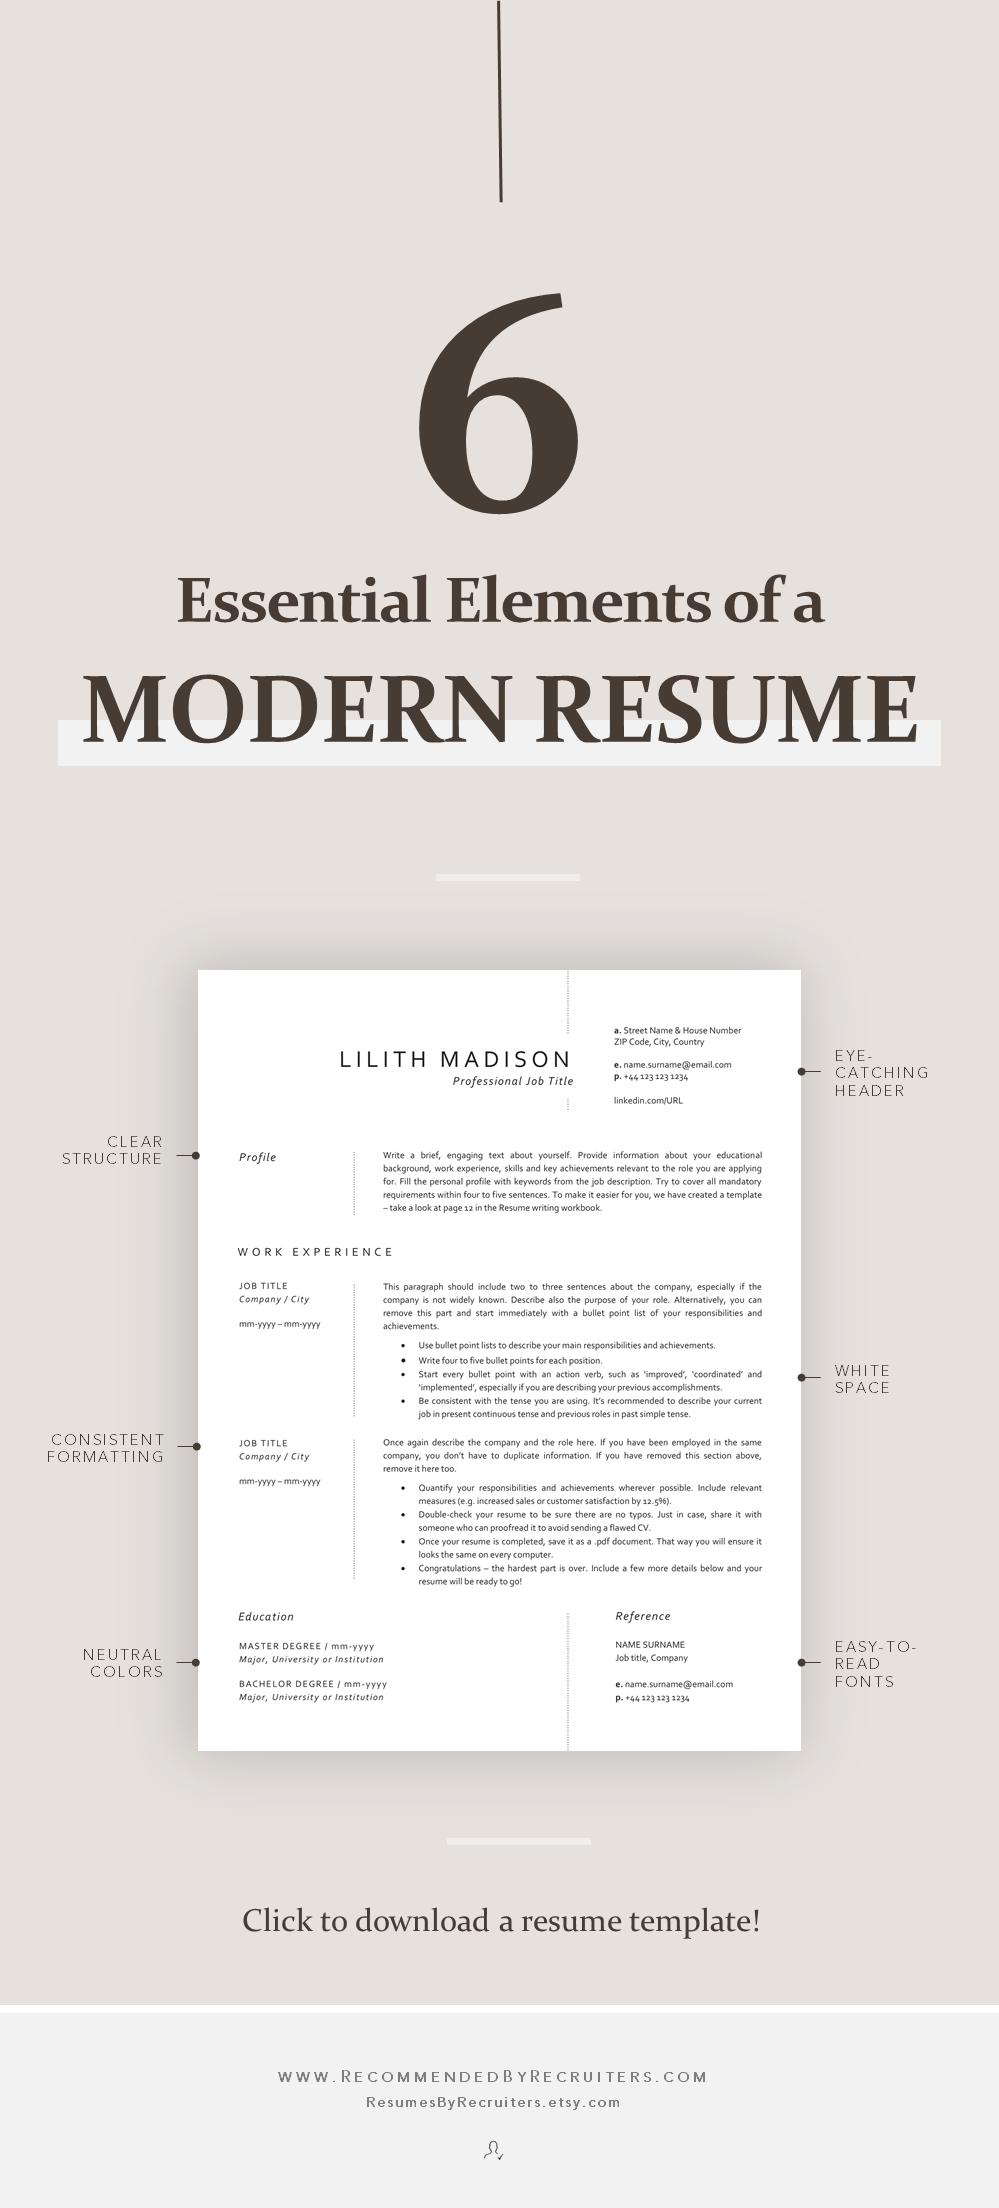 Pin on Resume Design Inspiration